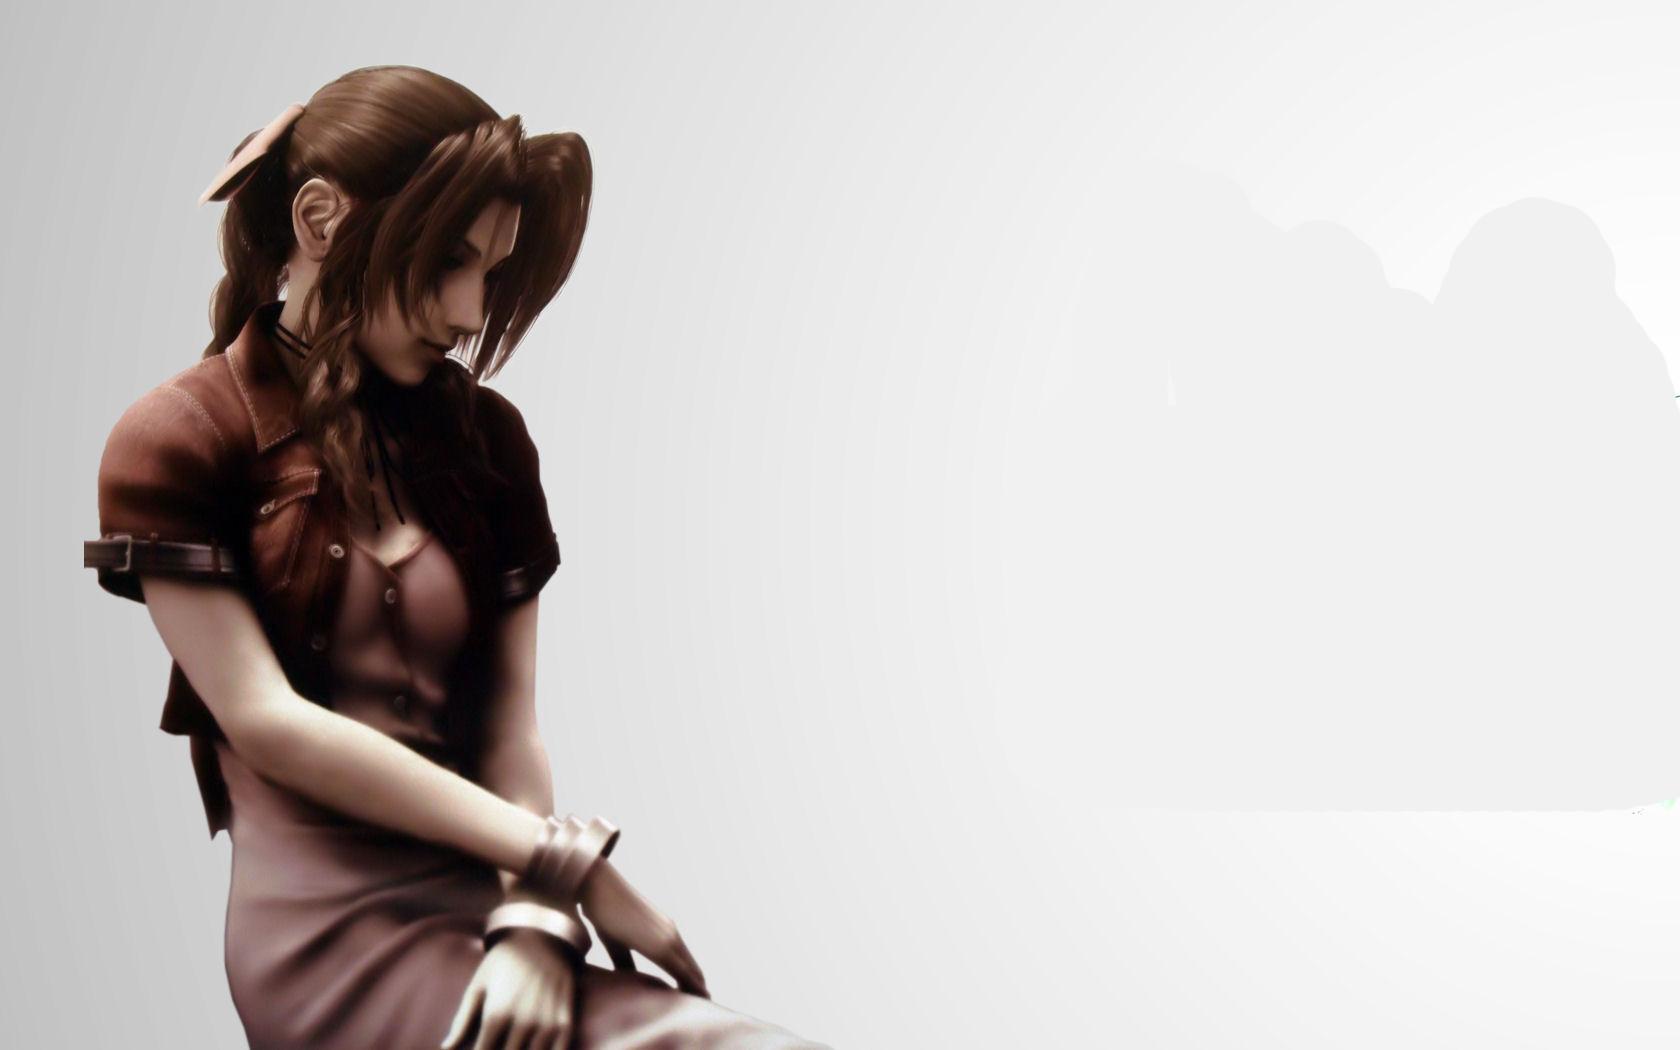 Final Fantasy VII Advent Children Wallpaper and 1680x1050